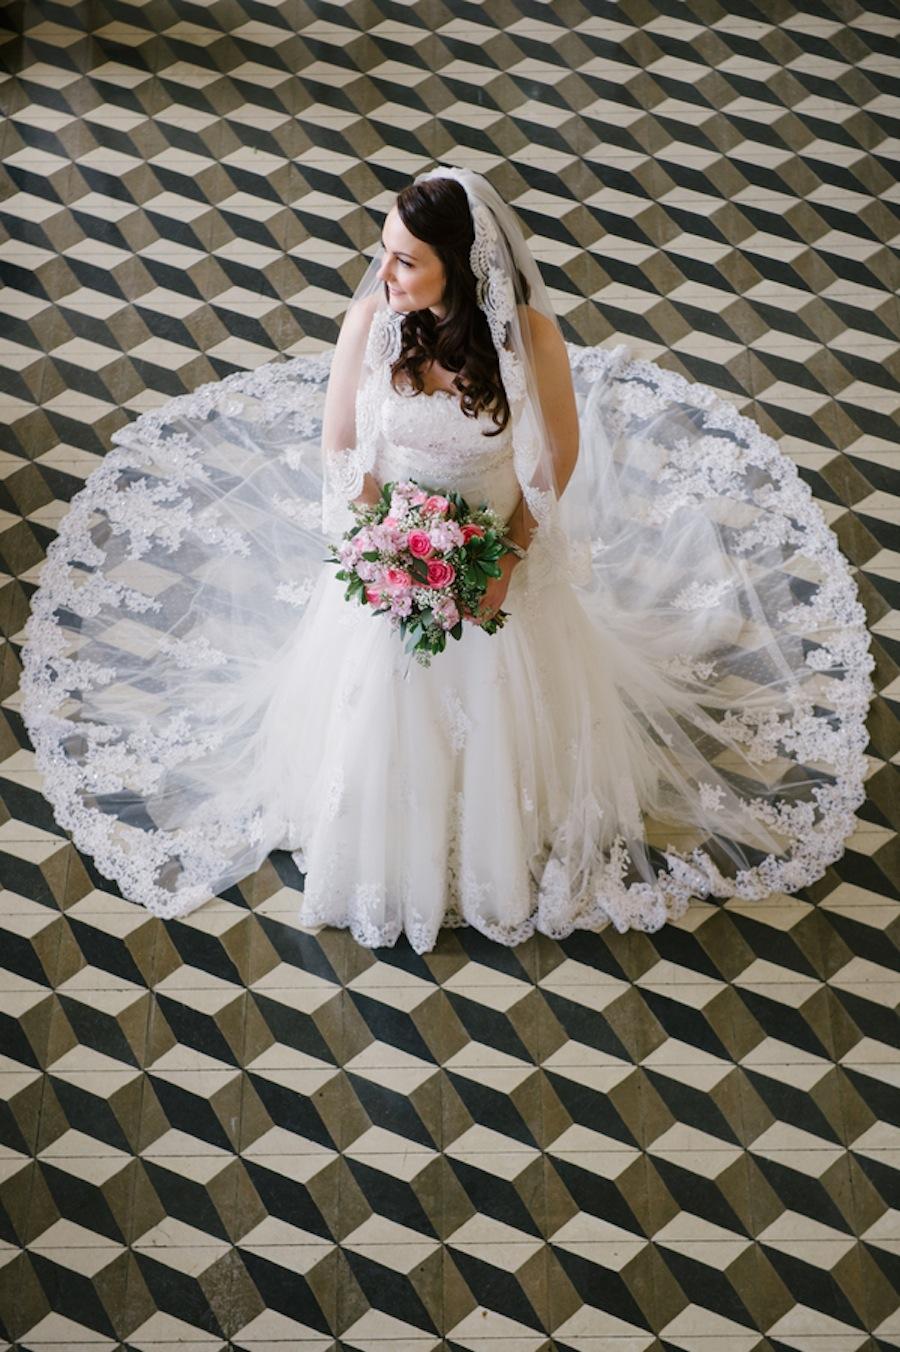 Lace Wedding Dress | Italian Club Bride - Marissa Moss Photography